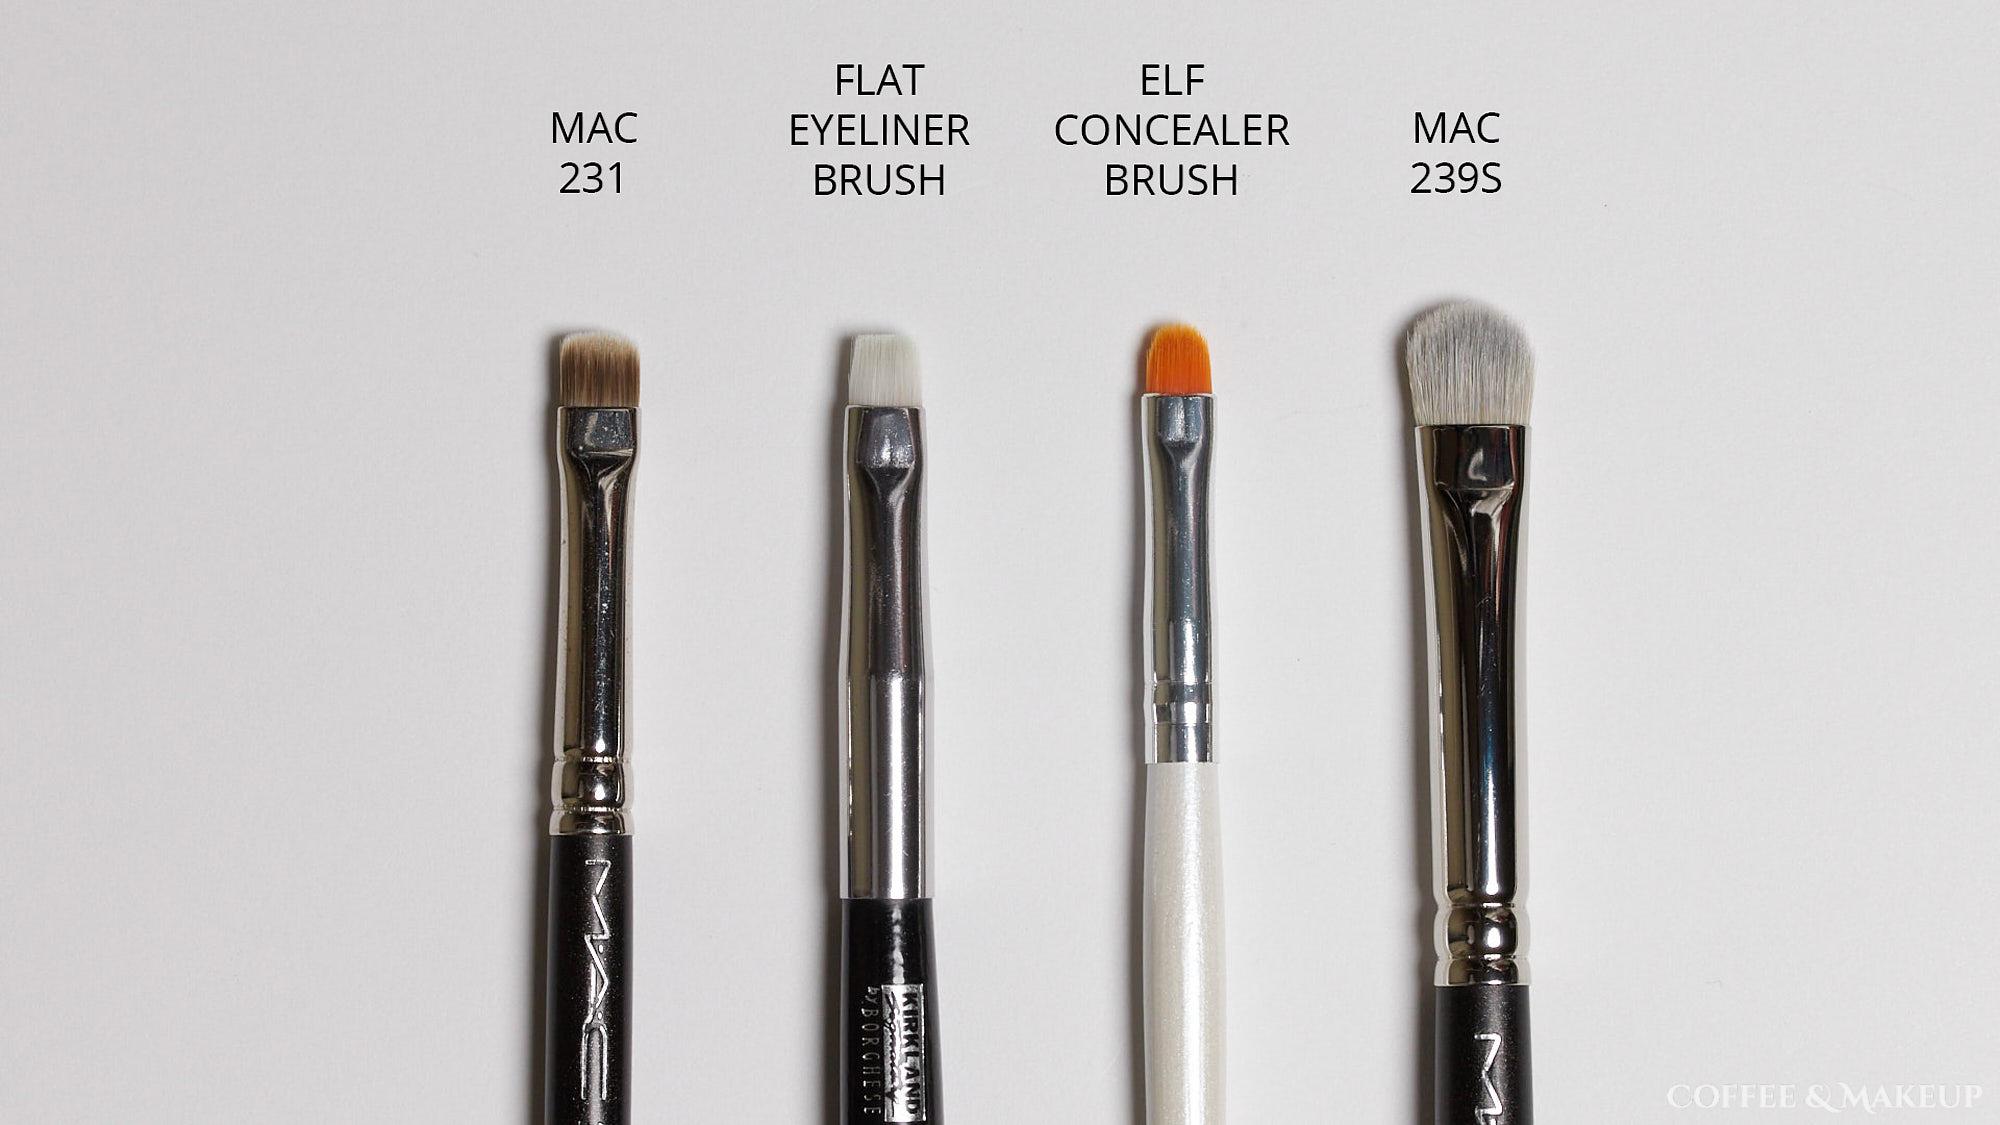 Mac 231 Brush Comparisons